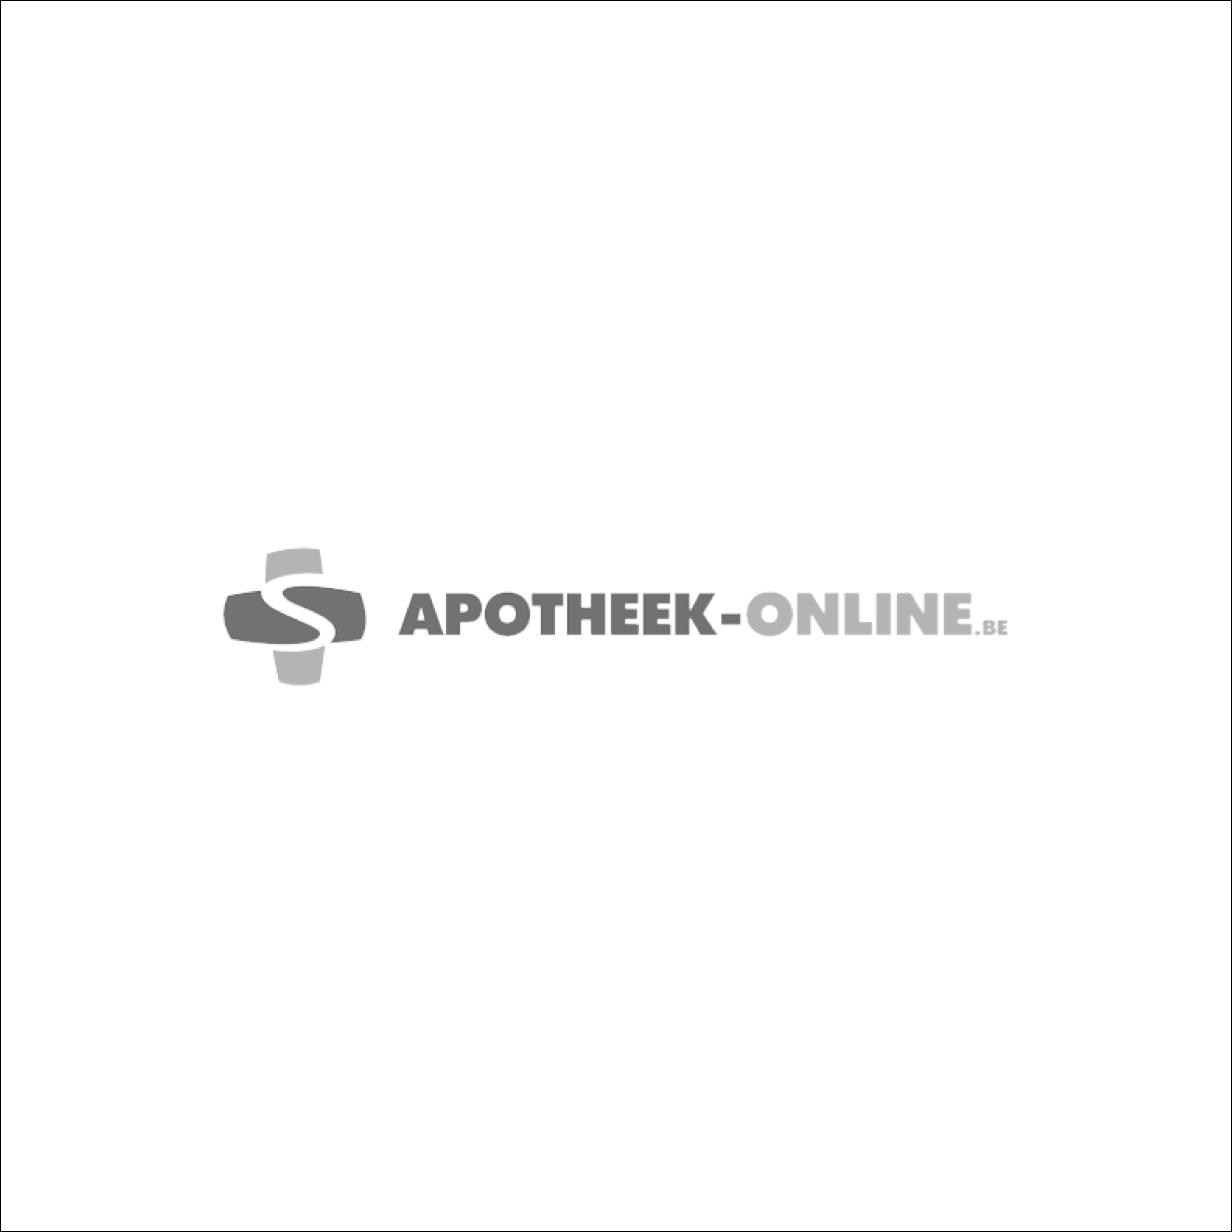 MESOFT CP STER 4C 10,0X10,0CM 75X 2 156340